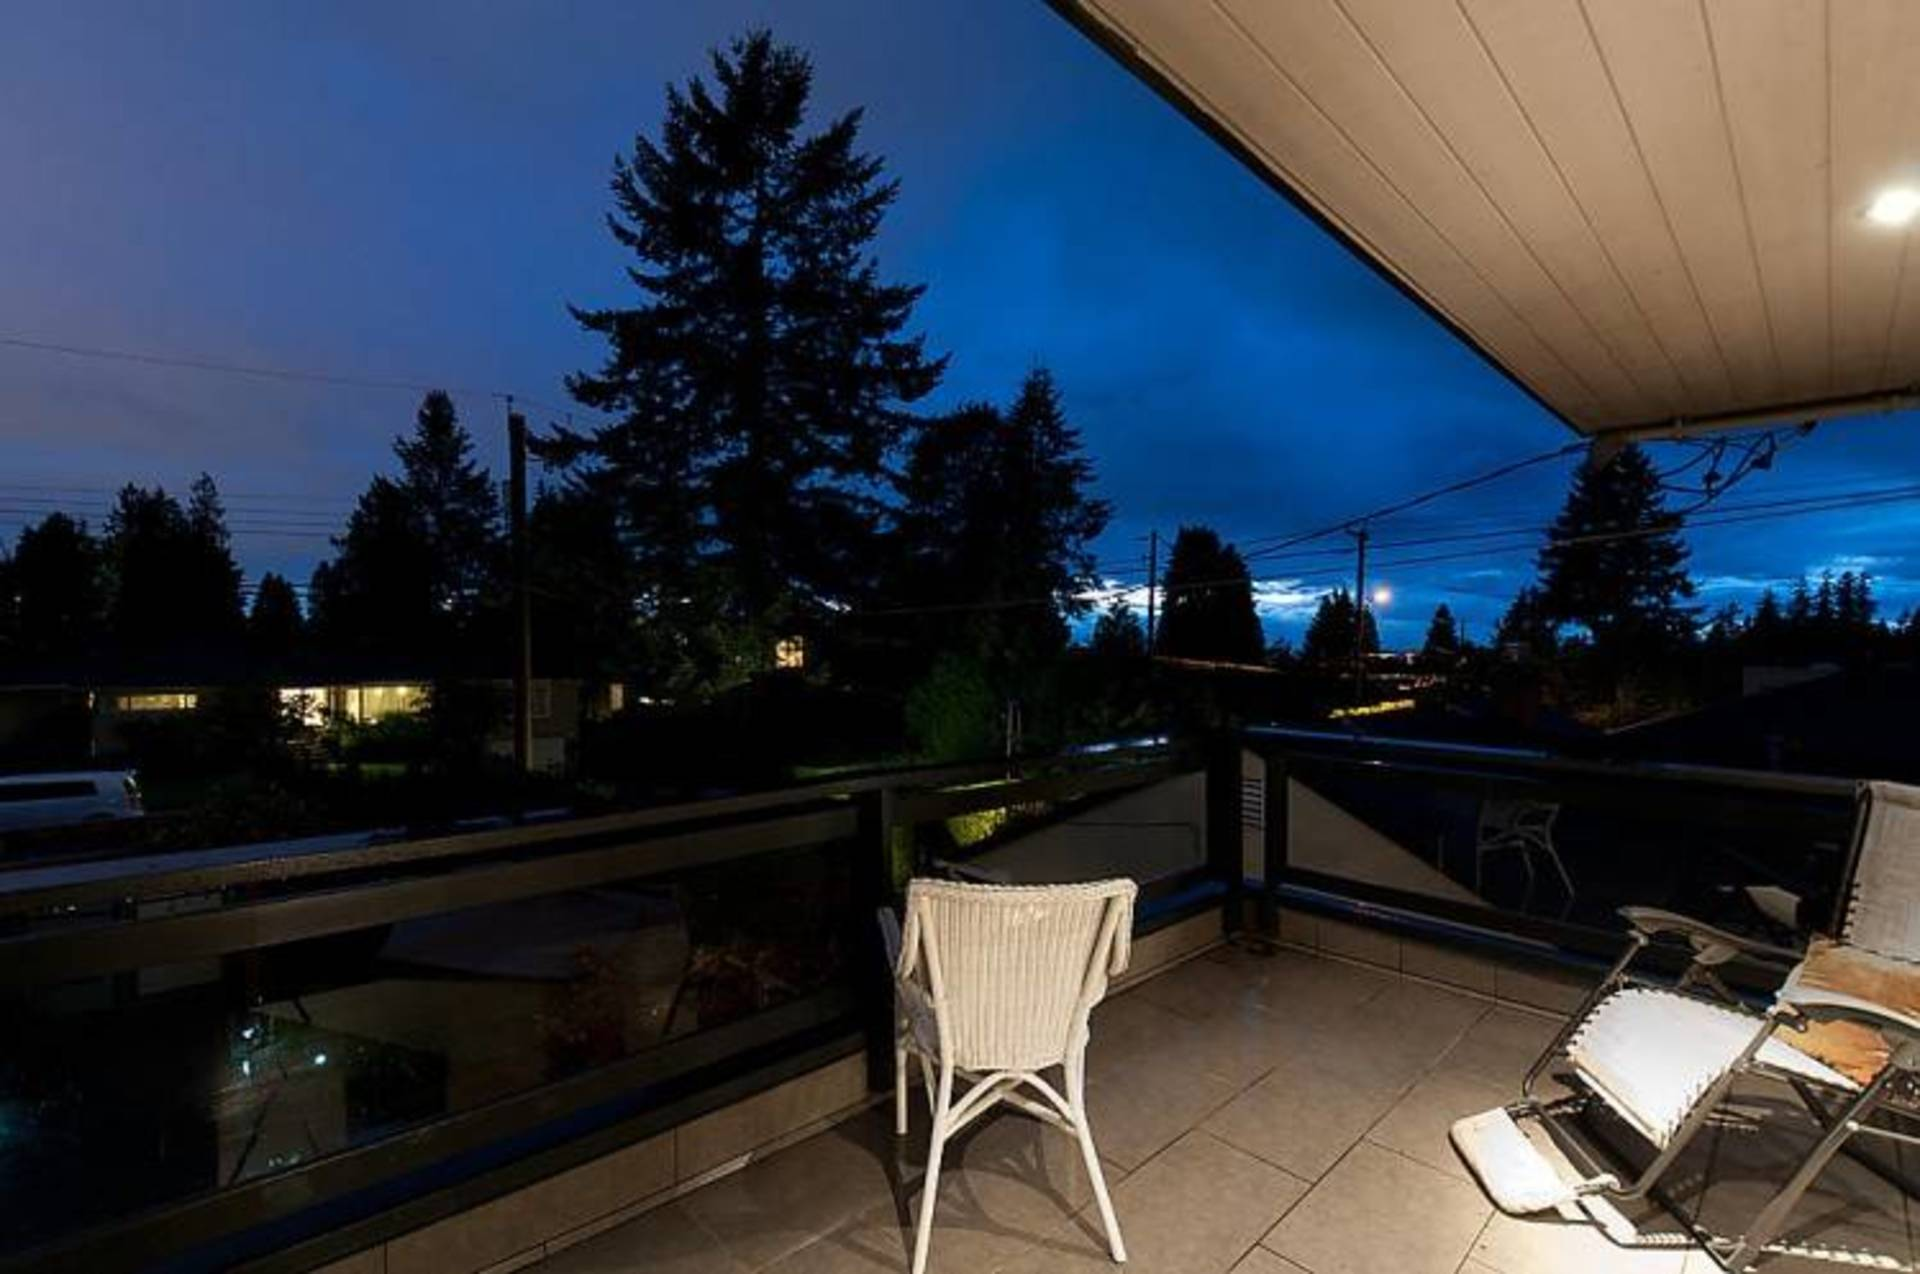 749x497_1077-jefferson-ave-ambleside-west-vancouver-19-15106 at 1077 Jefferson, Sentinel Hill, West Vancouver